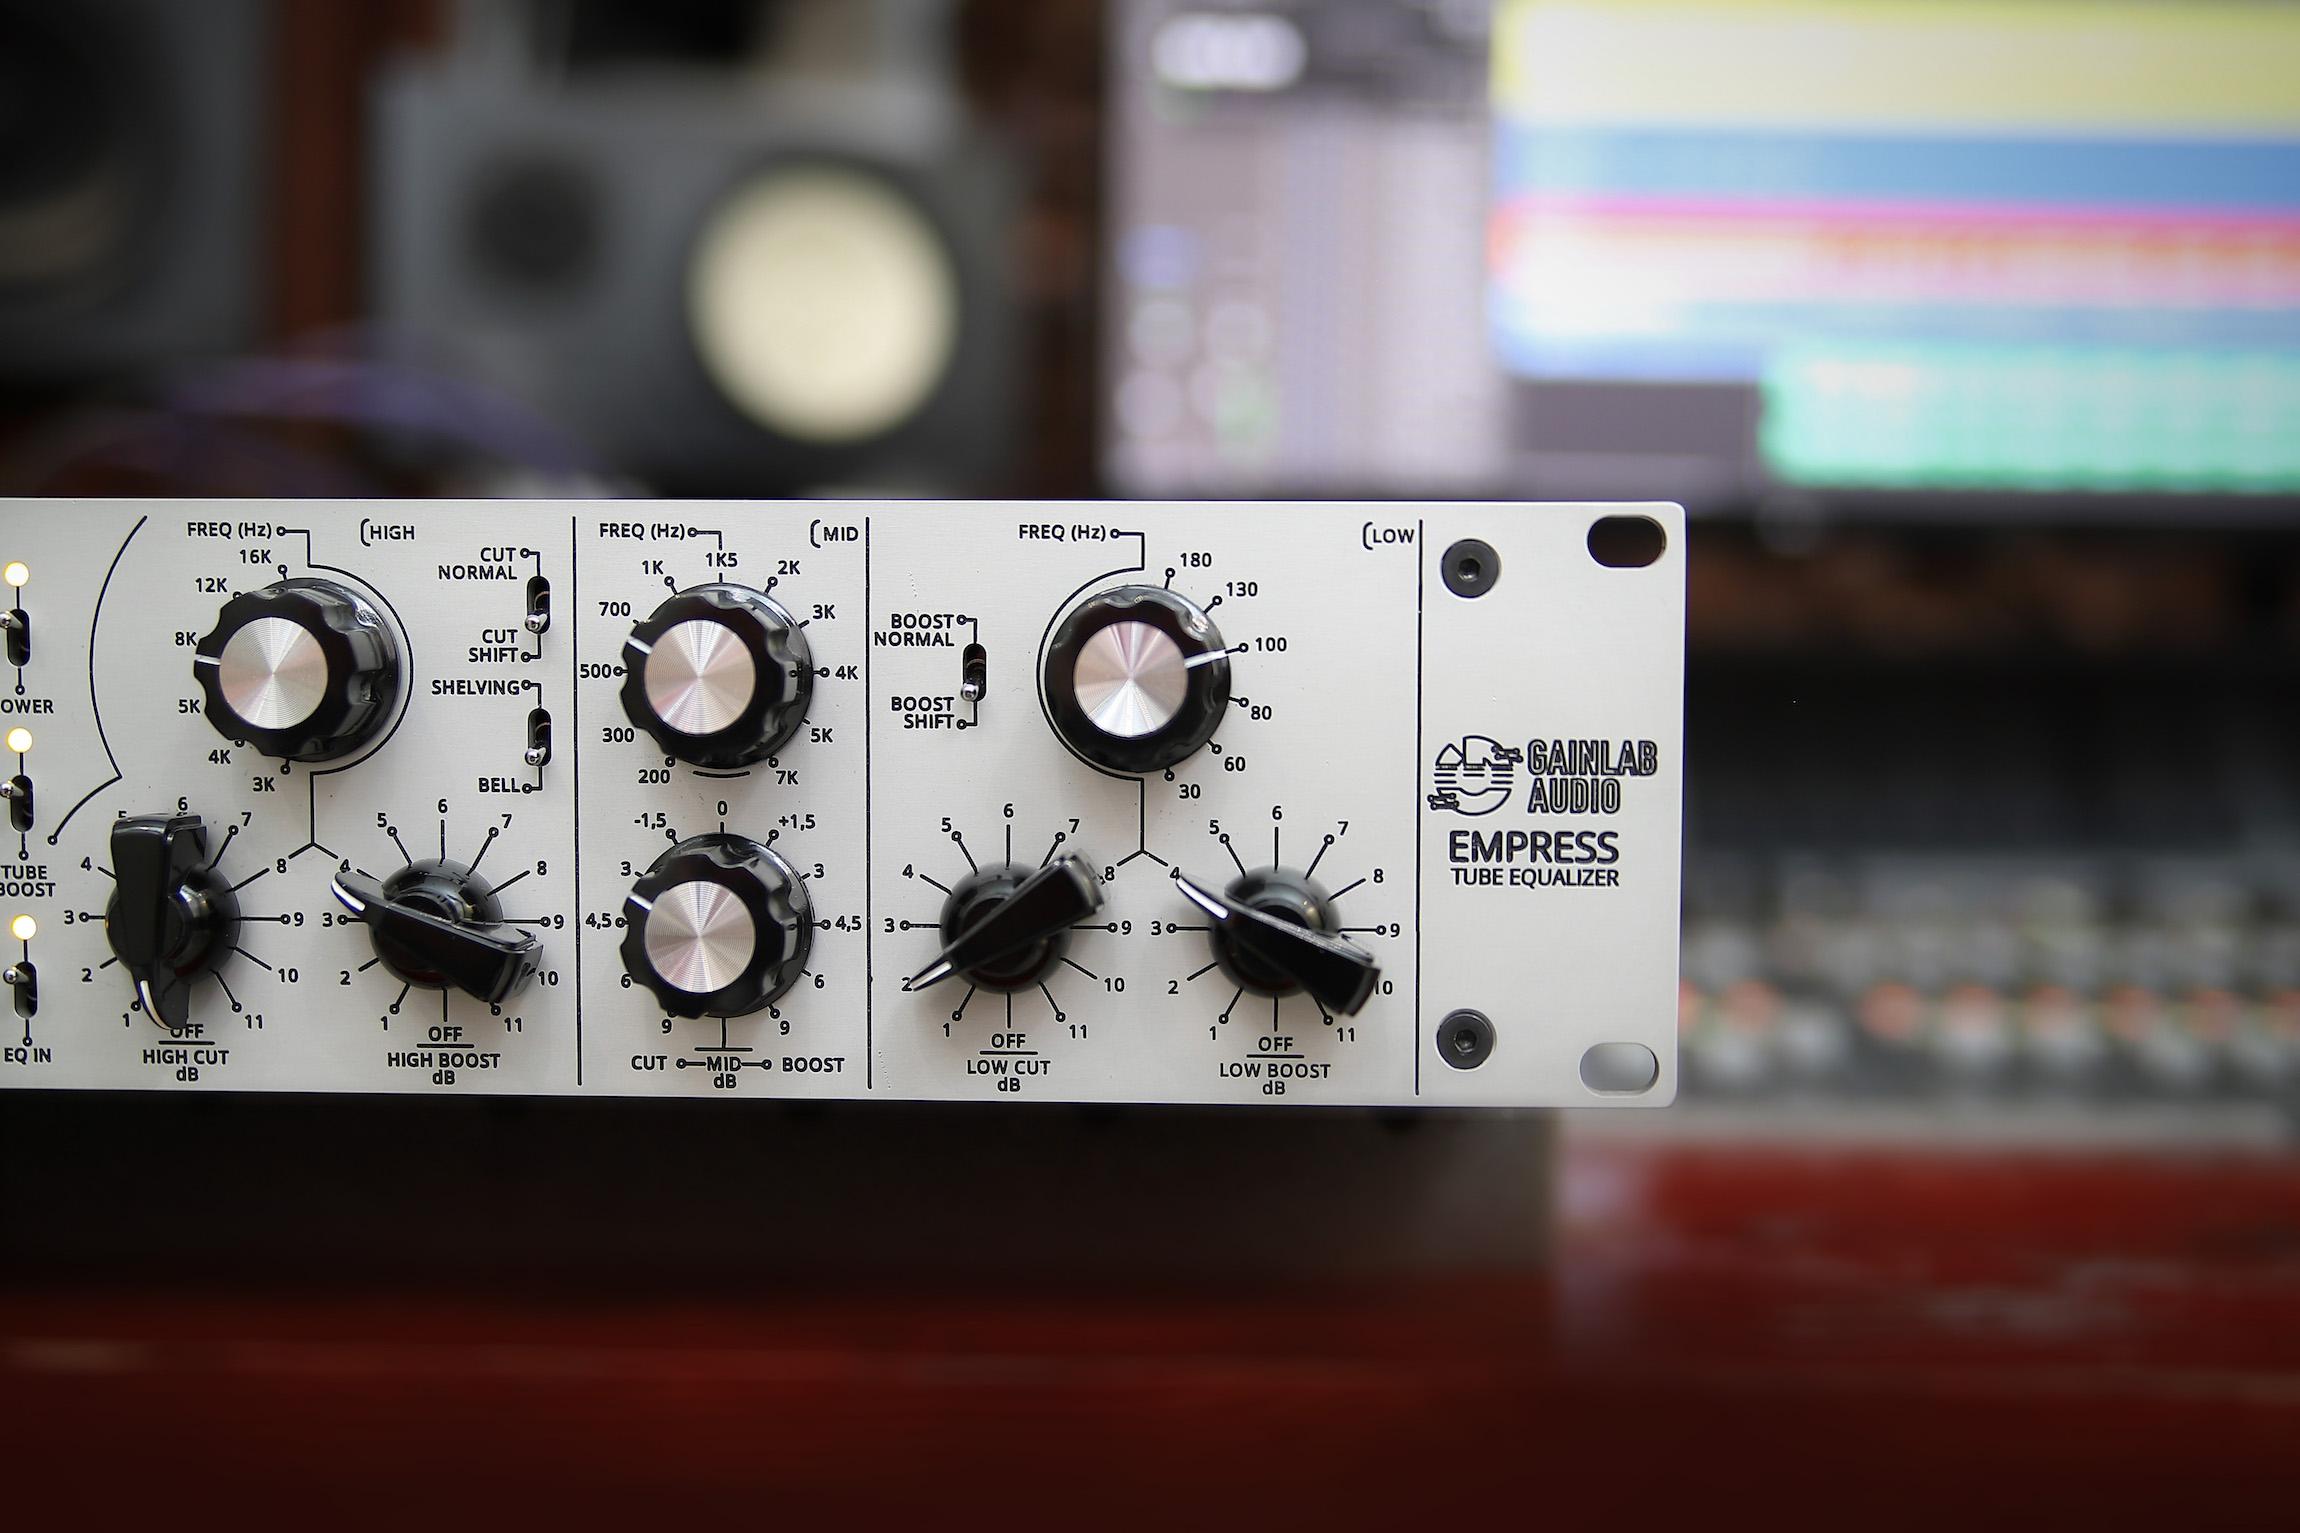 Gainlab Audio Empress Pro Audio Studio Equalizer Tube Pultech EQ Mastering Mixing